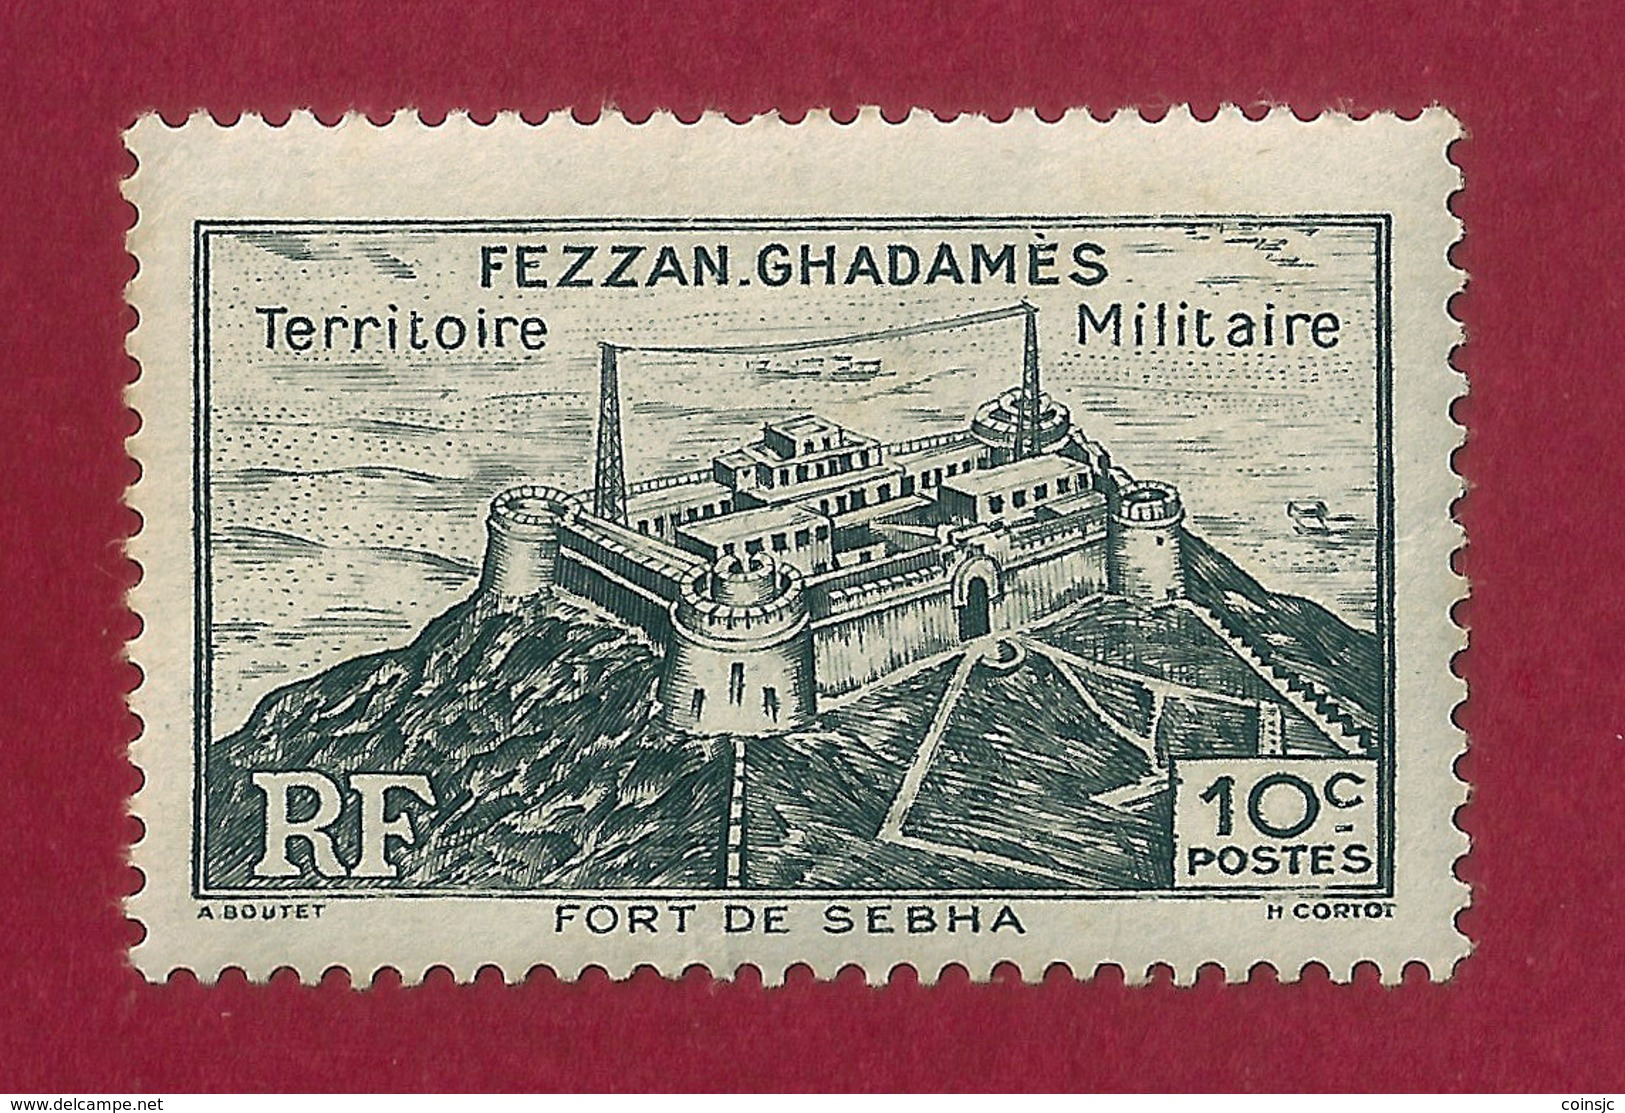 Fezzan.Ghadamés - 10 C - 1946 - Unused Stamps